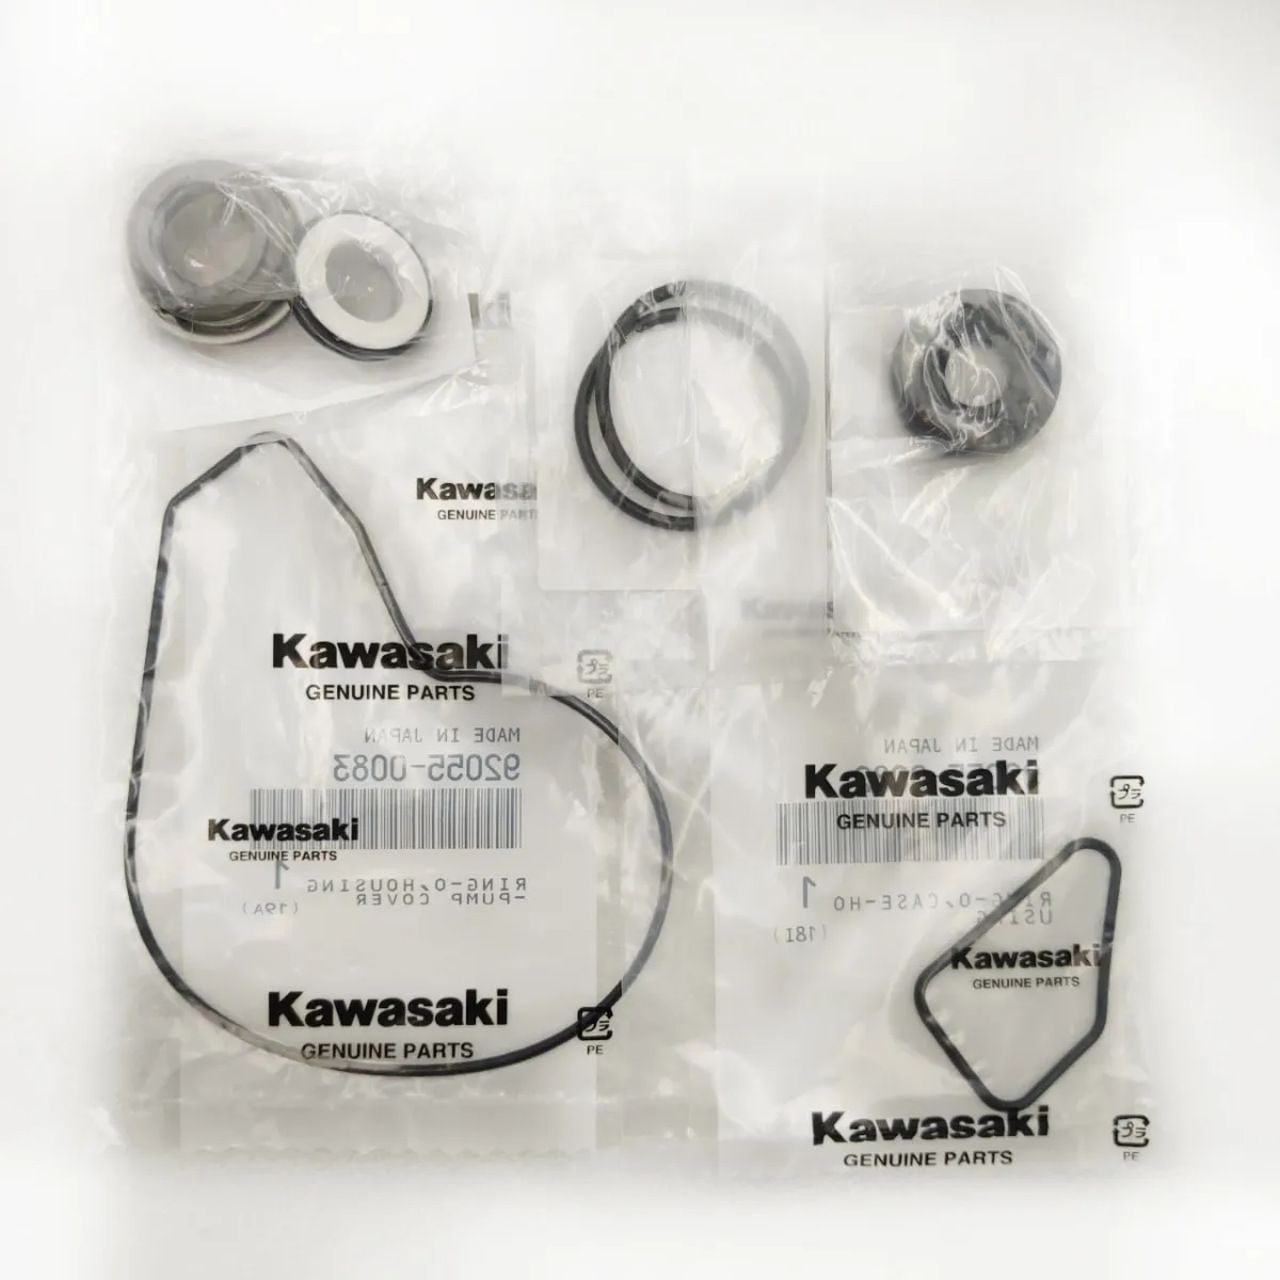 Kit de Reparo da Bomba d'Água | Original | Kawasaki Ninja 650 (2010 - 2017)